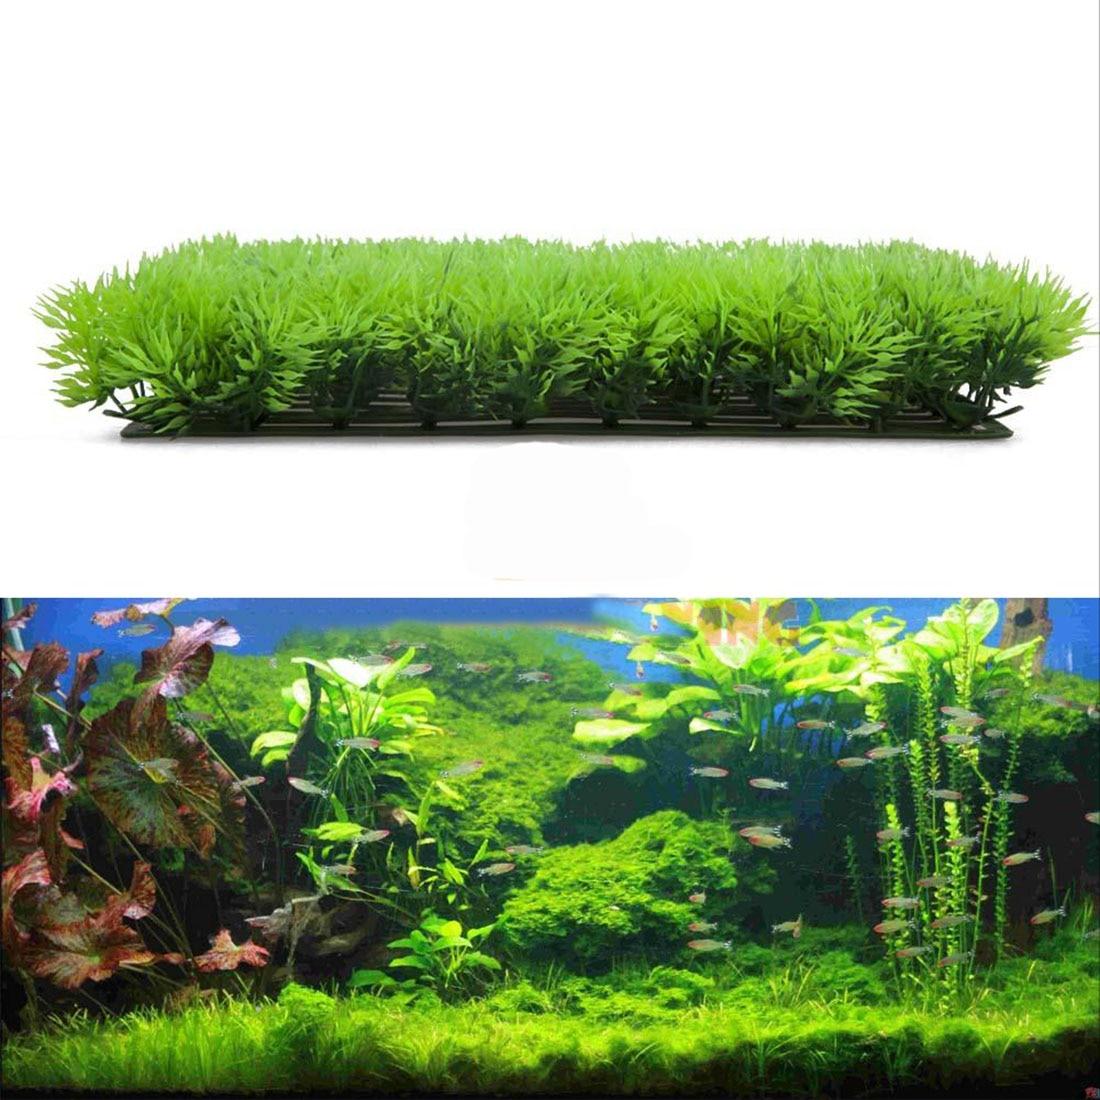 New Arrival Artificial Plastic Lawn Water Aquatic Grass Plant Fish Tank Landscape Underwater Beautiful Water Plant Ornament